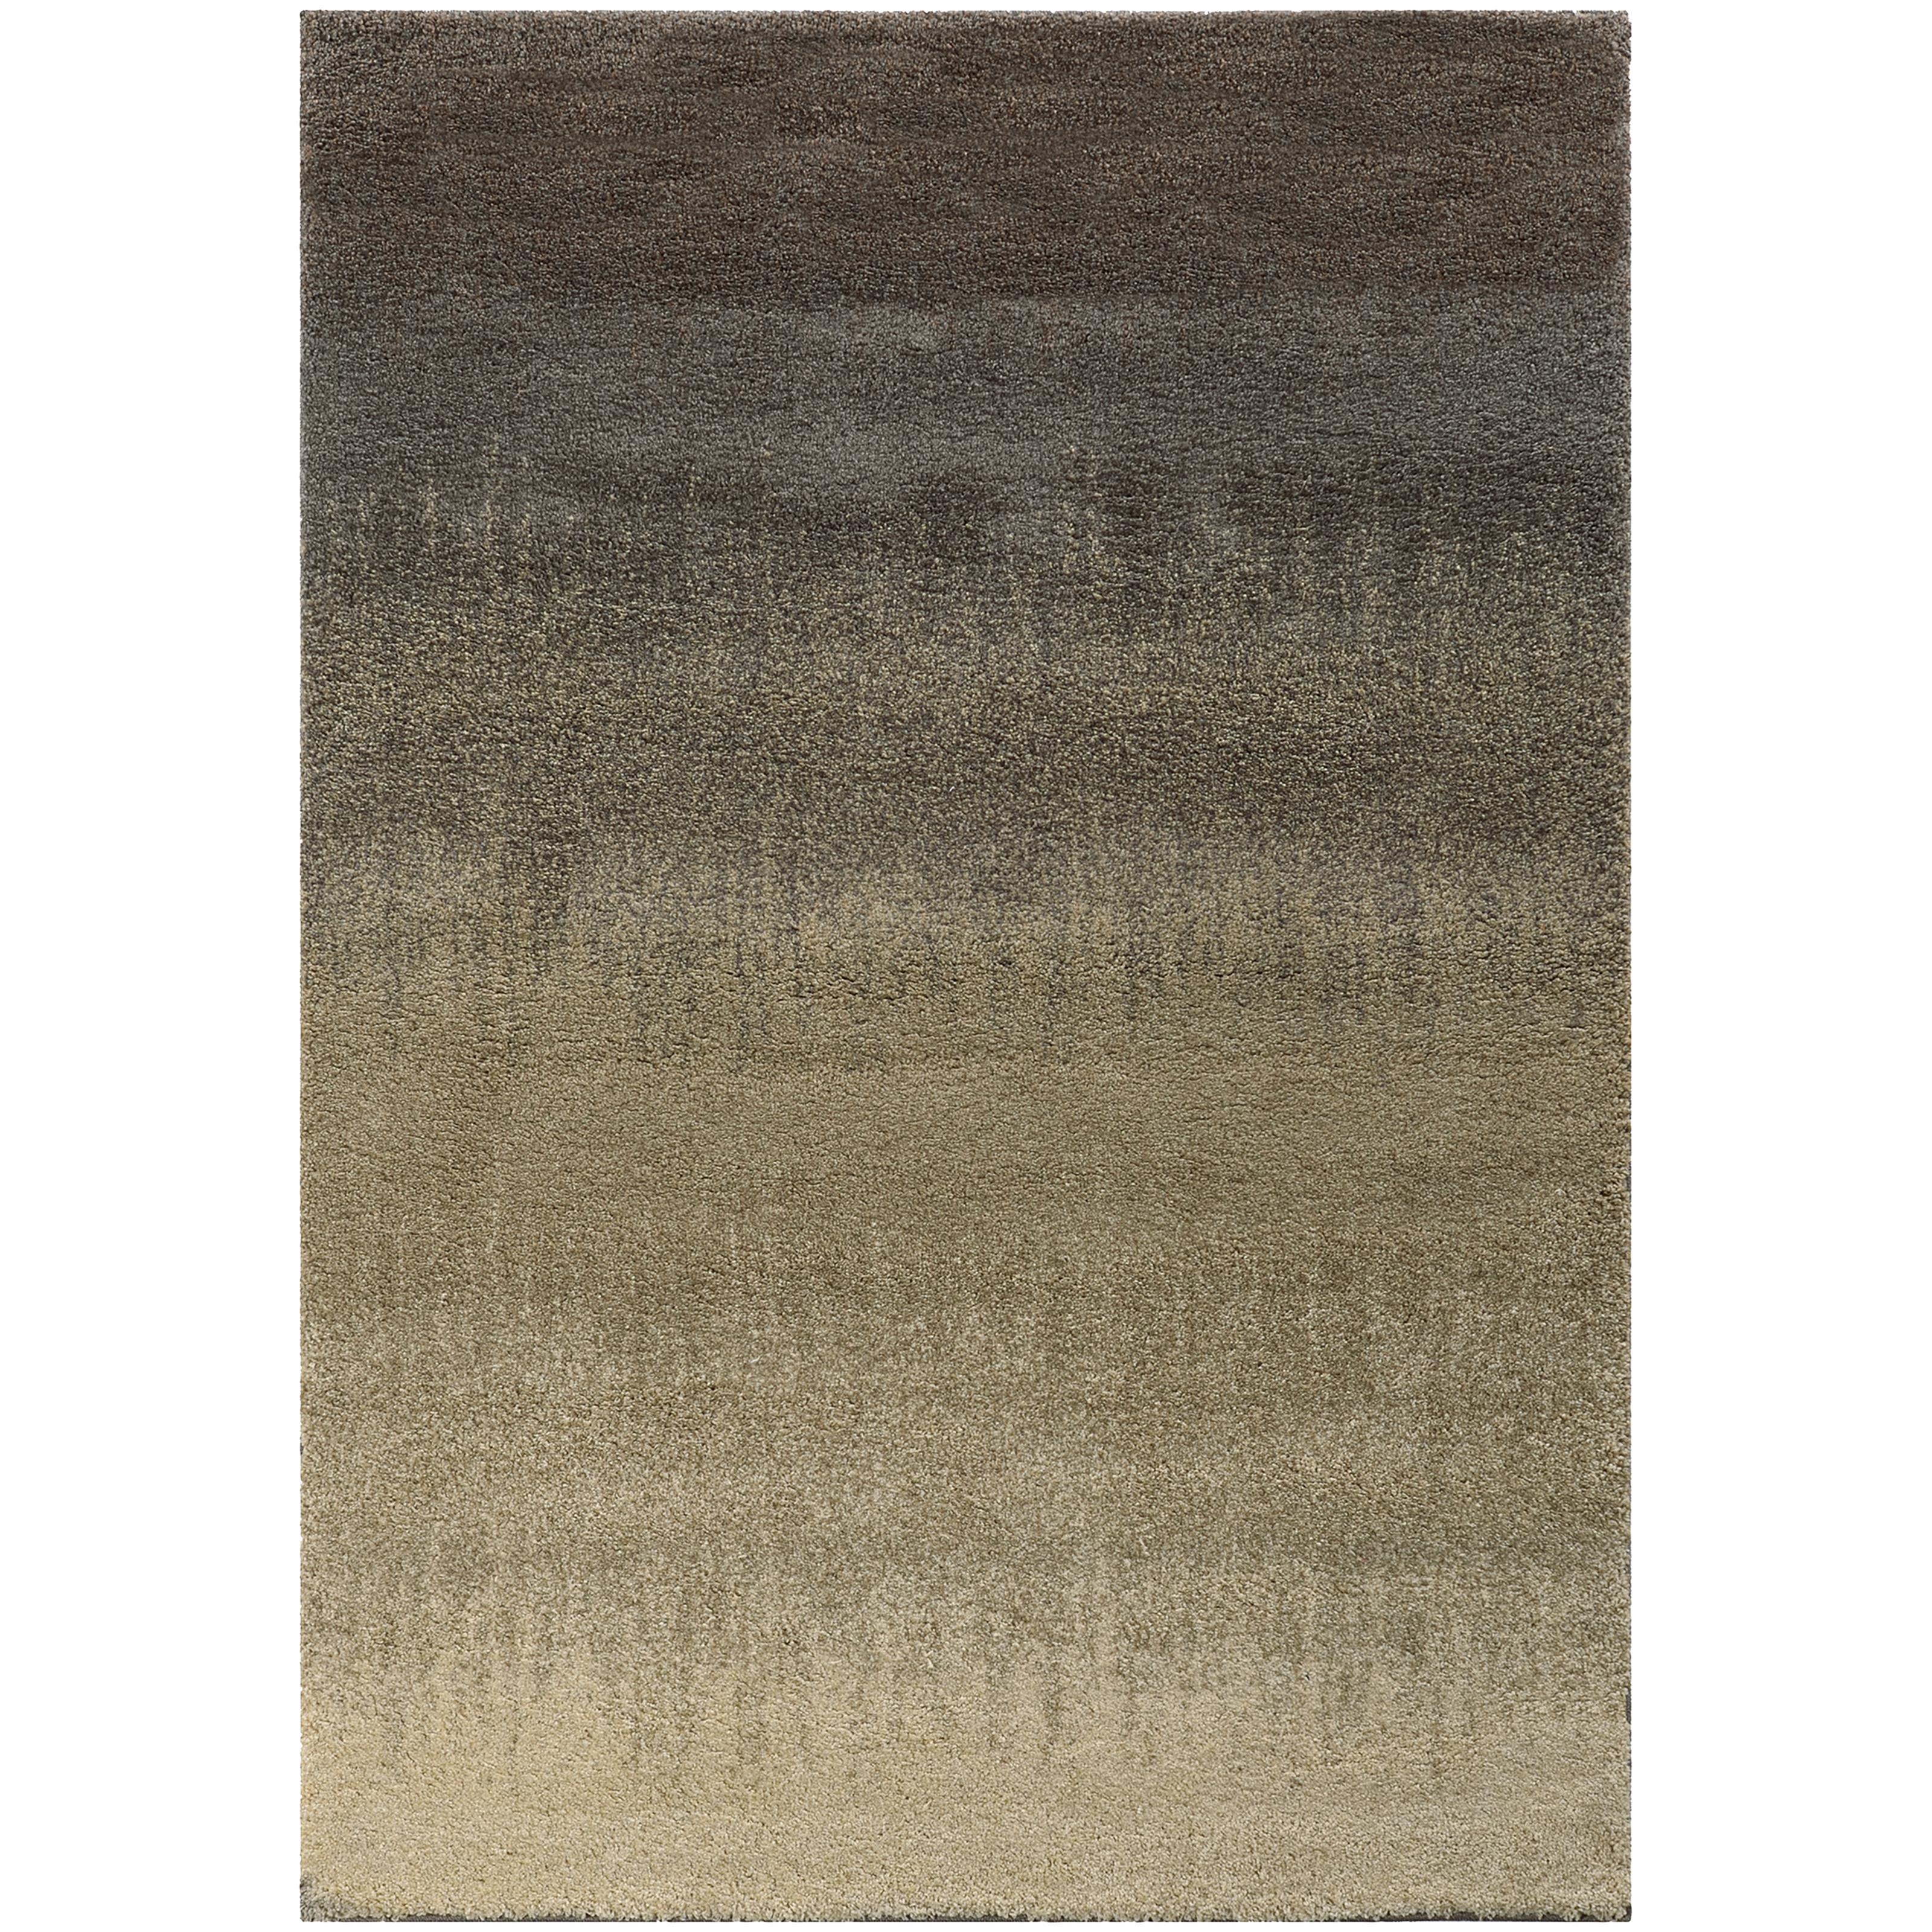 "Oriental Weavers Covington 5' 3"" X  7' 6"" Rug - Item Number: C002J6160230ST"